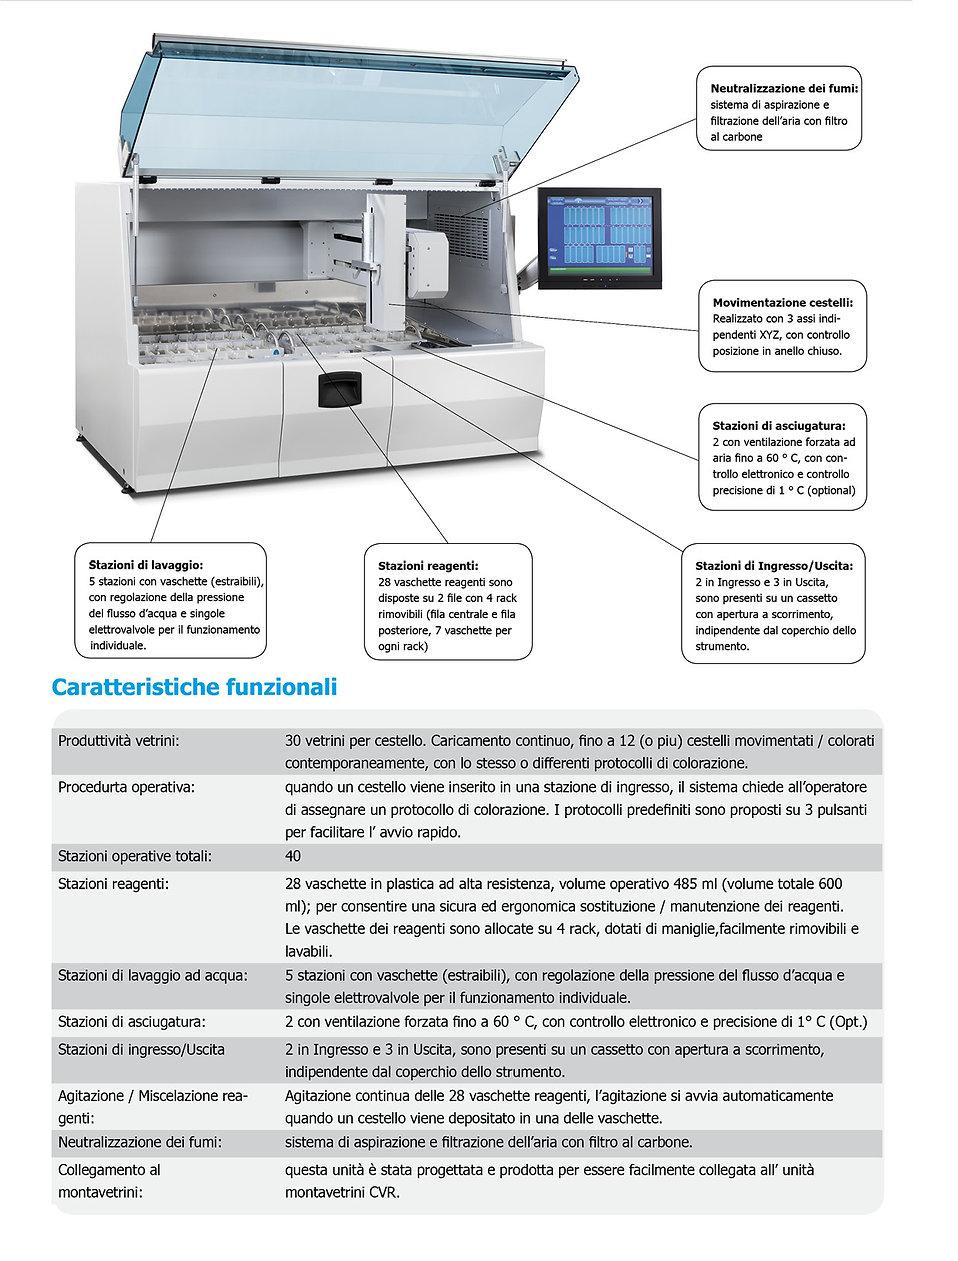 Intelsint Brochure AUS3 IT 202009 A44R.j